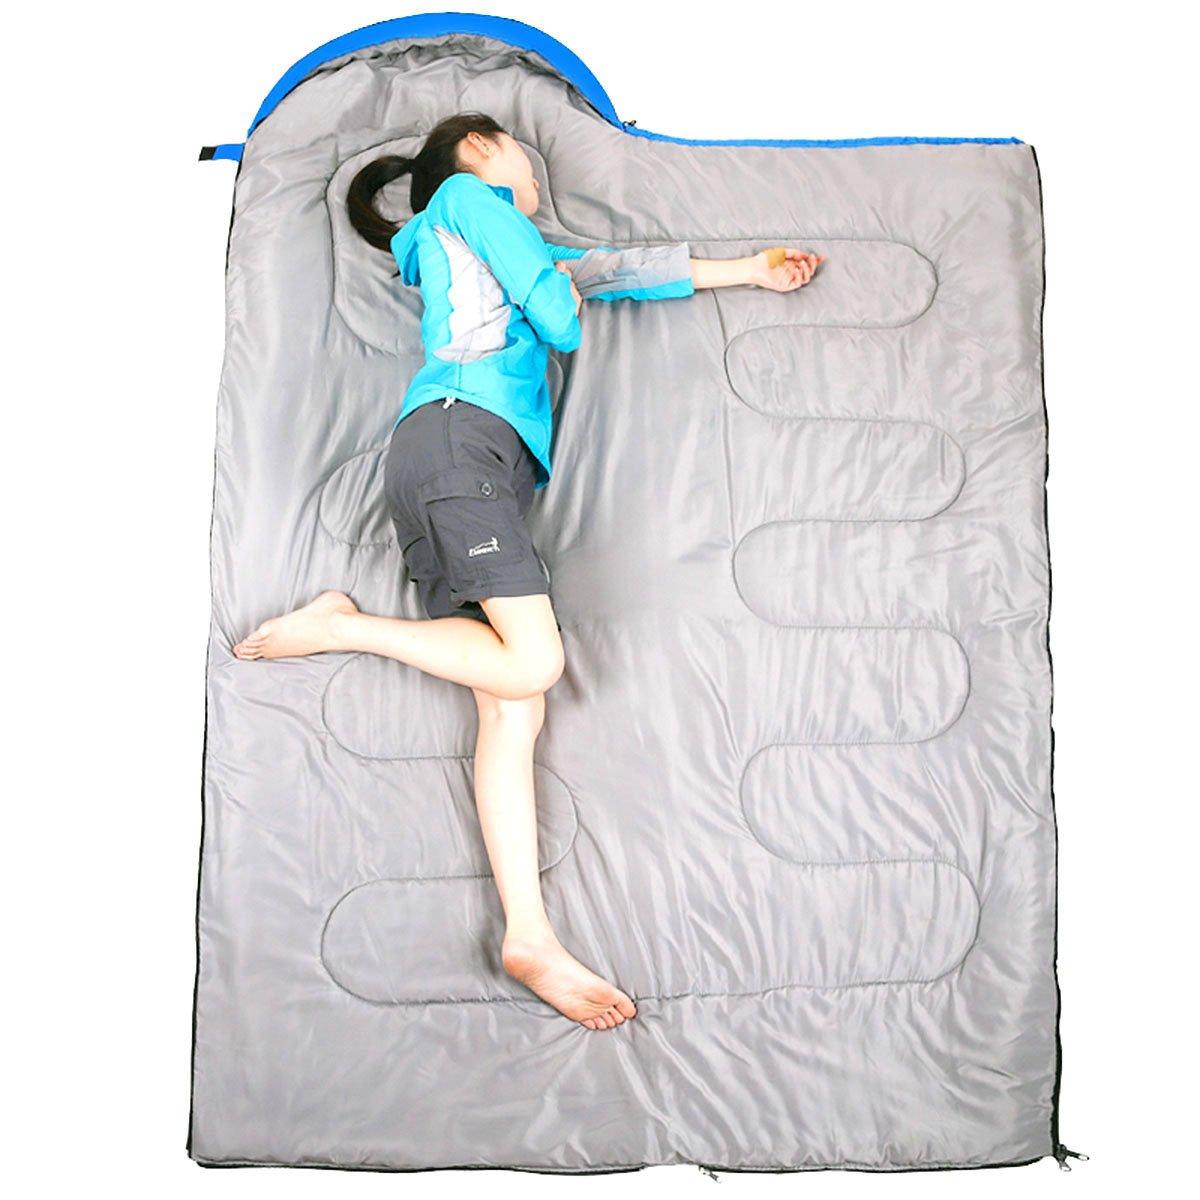 Homiki Saco de Dormir Ligero para Camping Senderismo Monta/ñas Ultraligero Impermeable Color Azul Sacos Bolsas T/érmicas